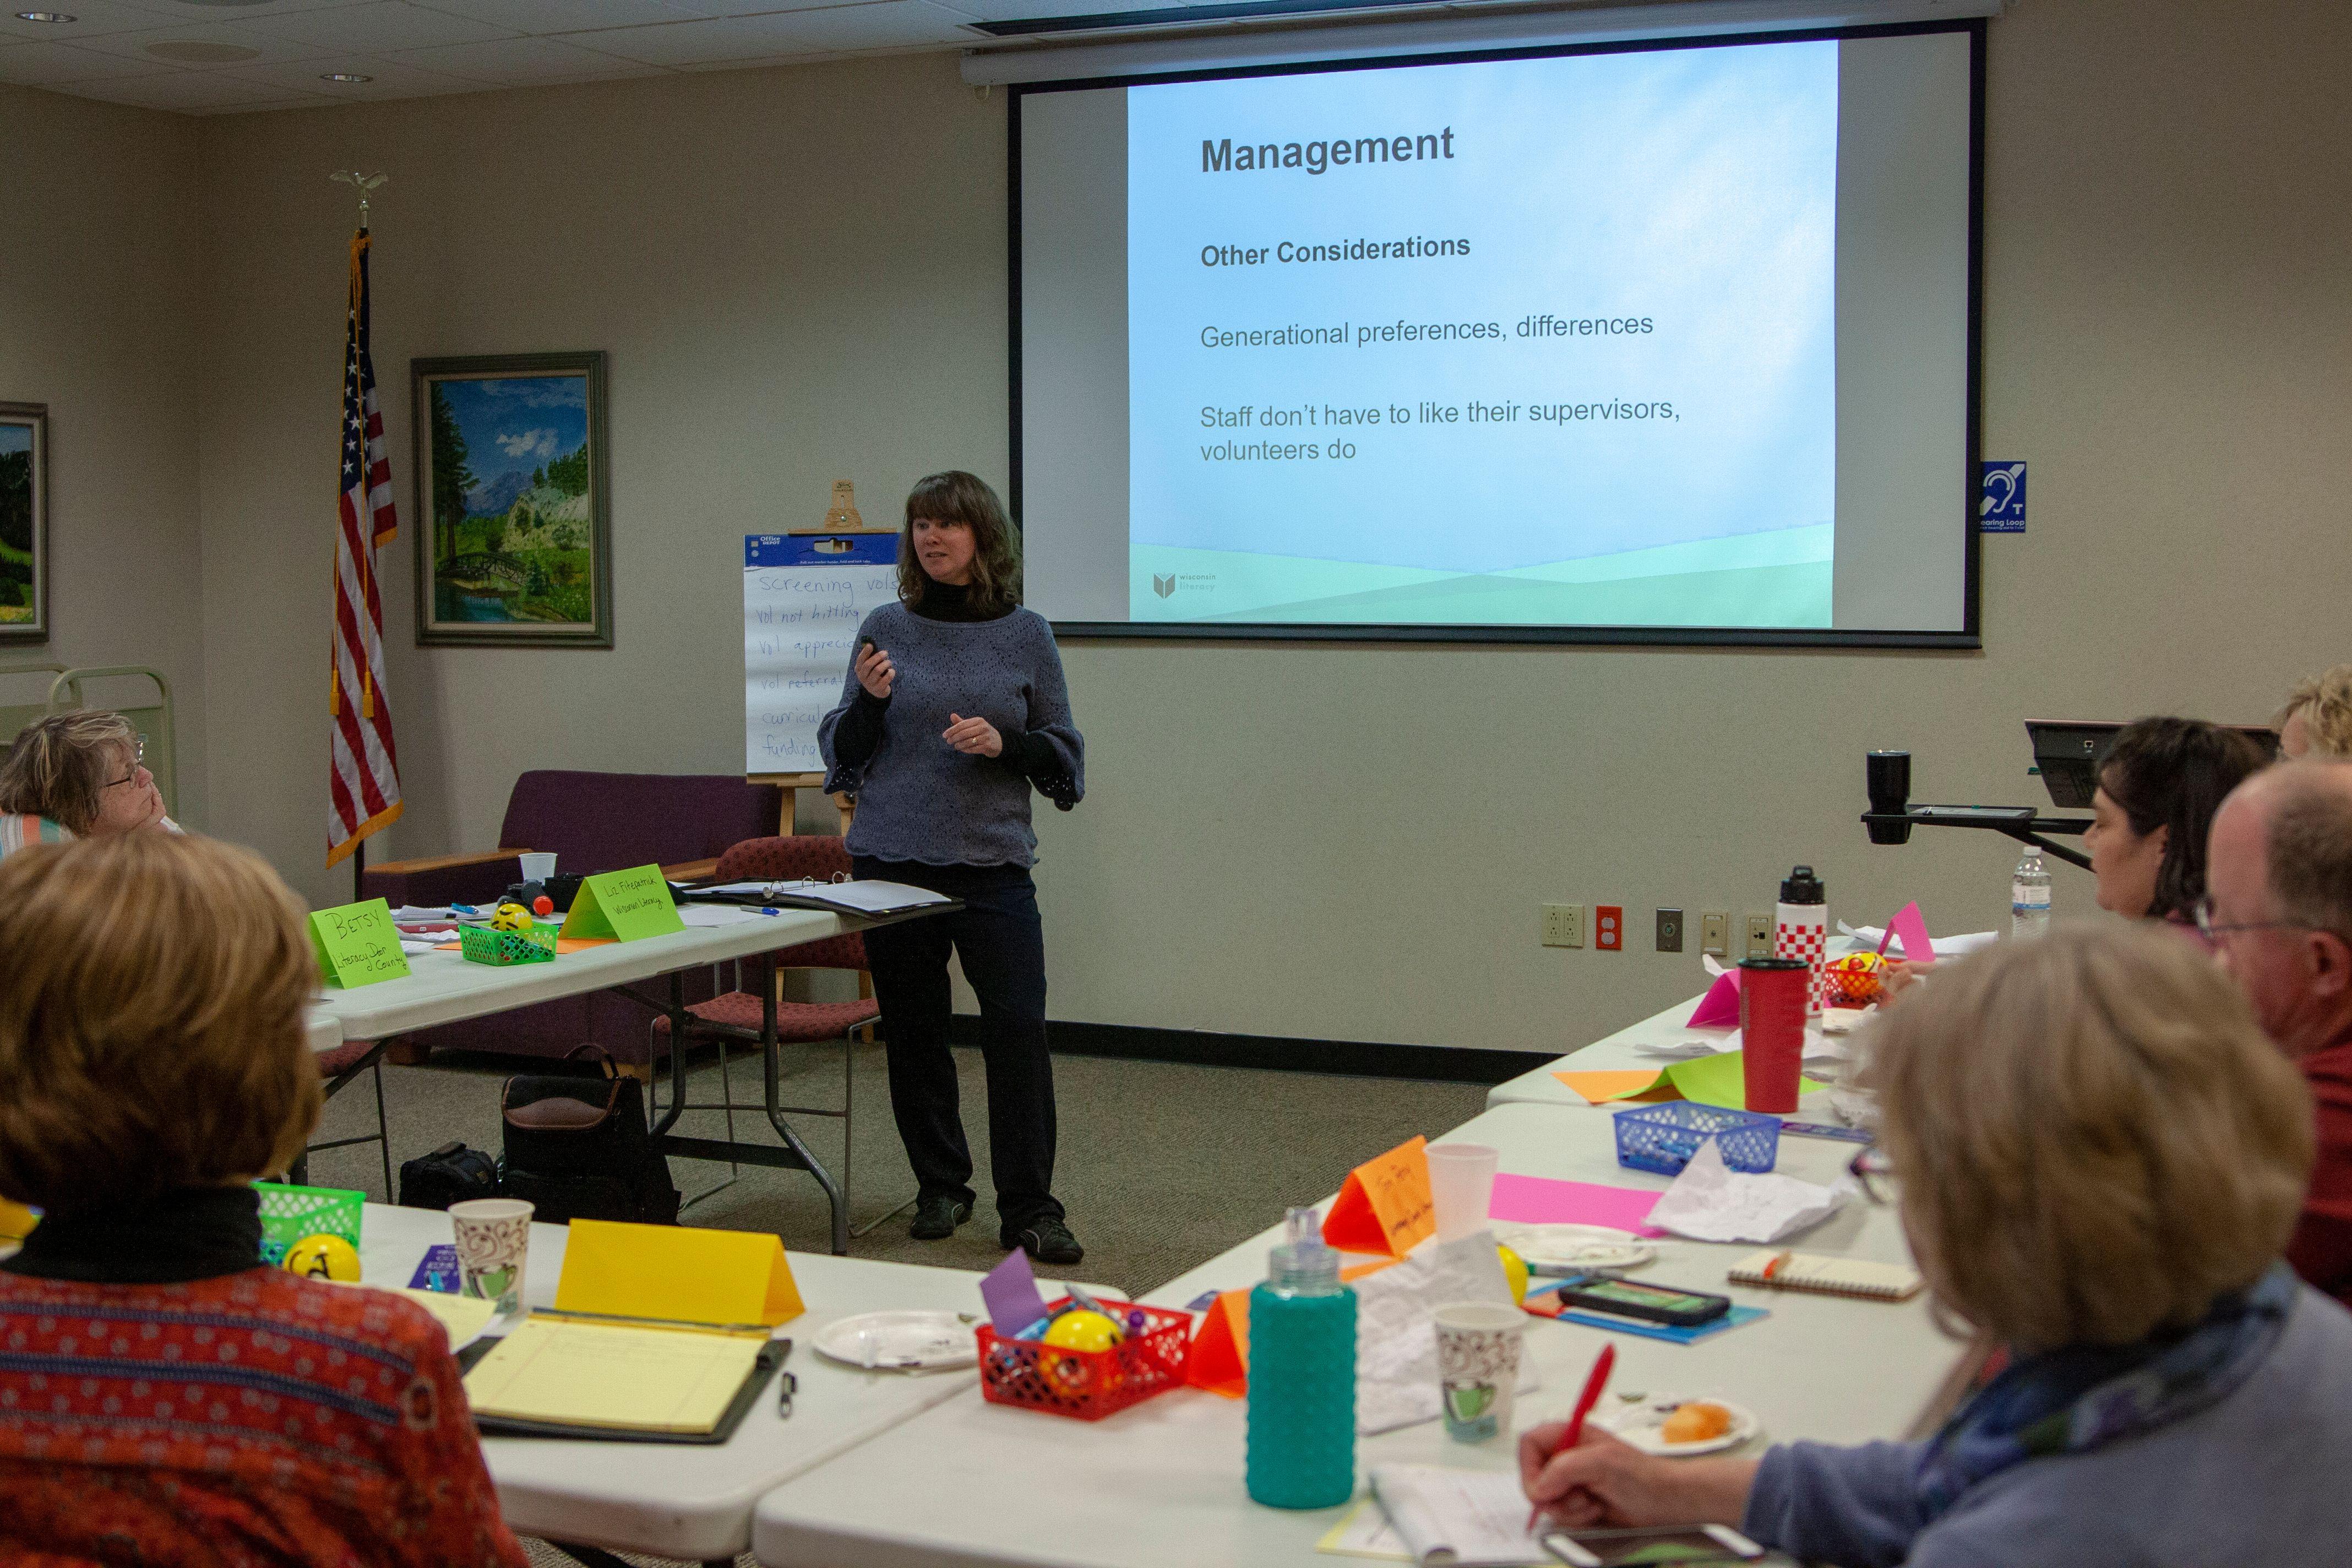 Take advantage of professional development